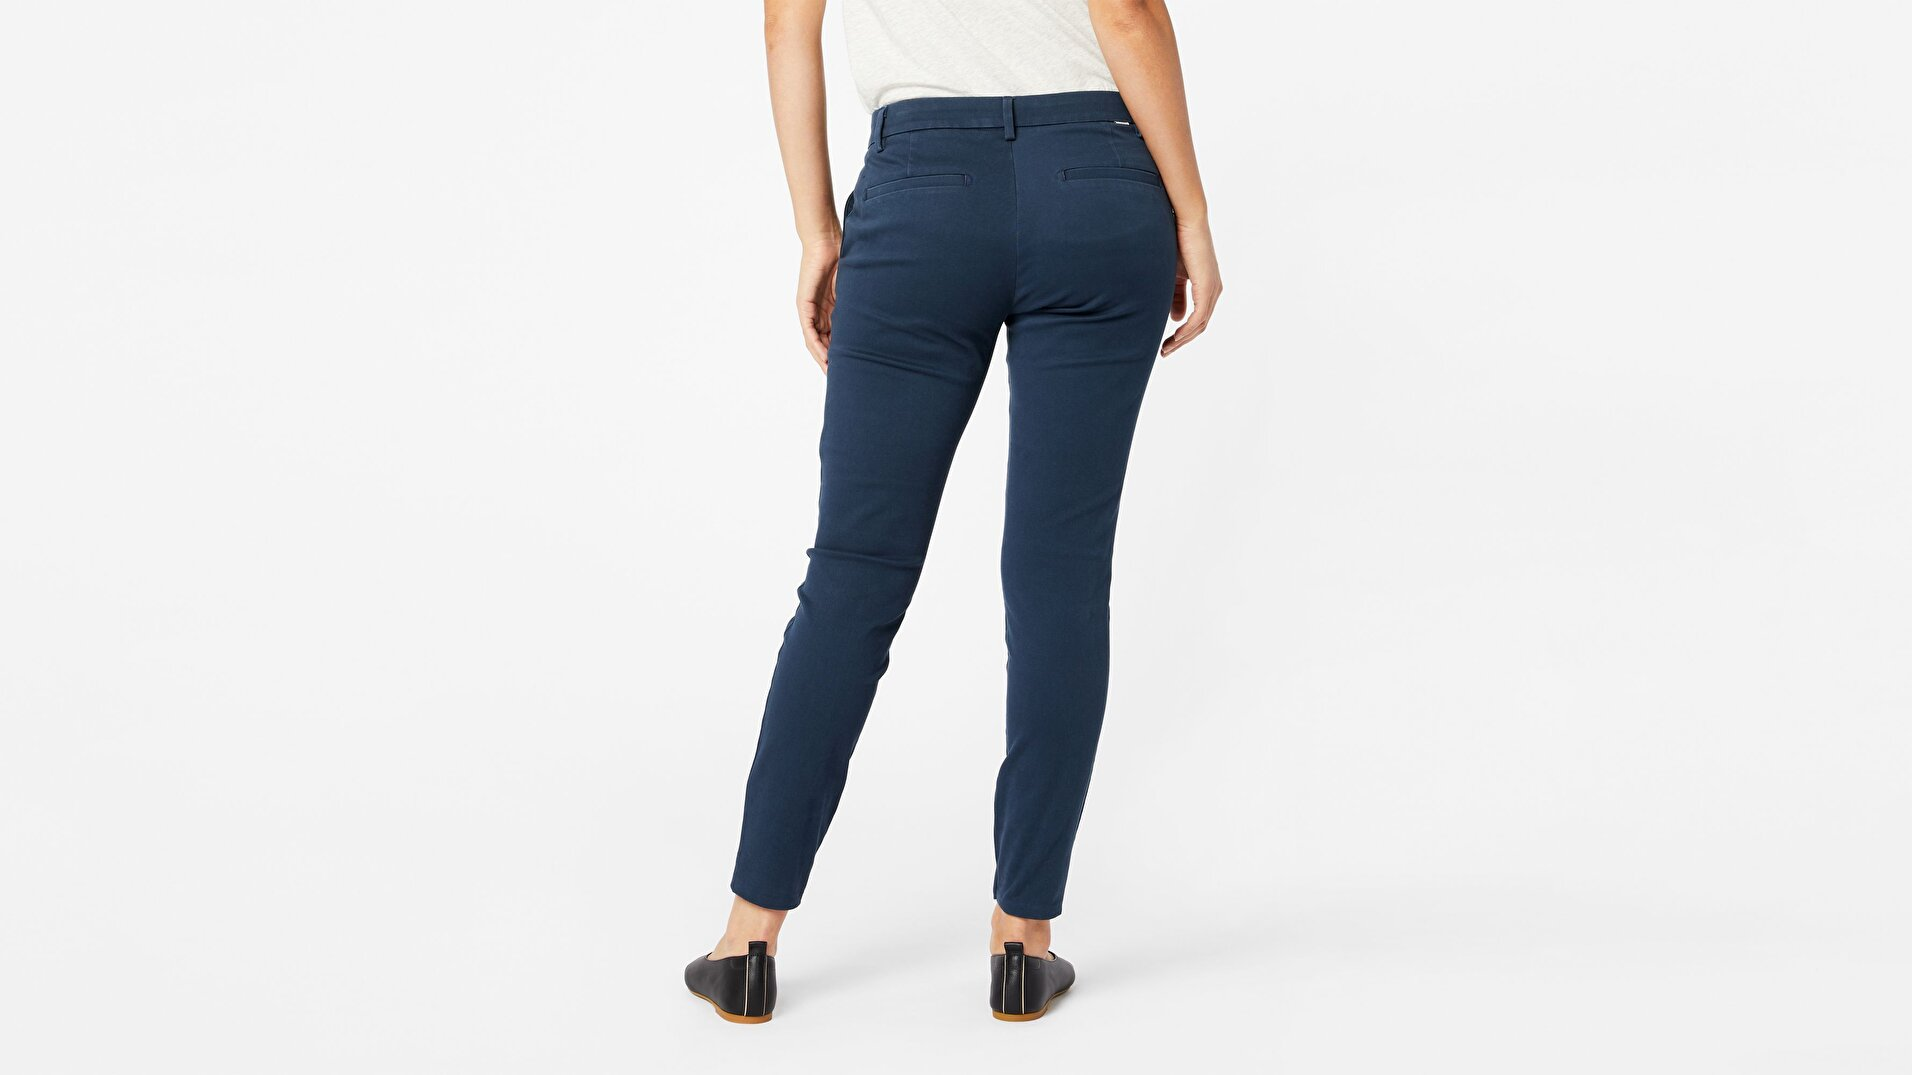 Chino Pantolon, Skinny Fit